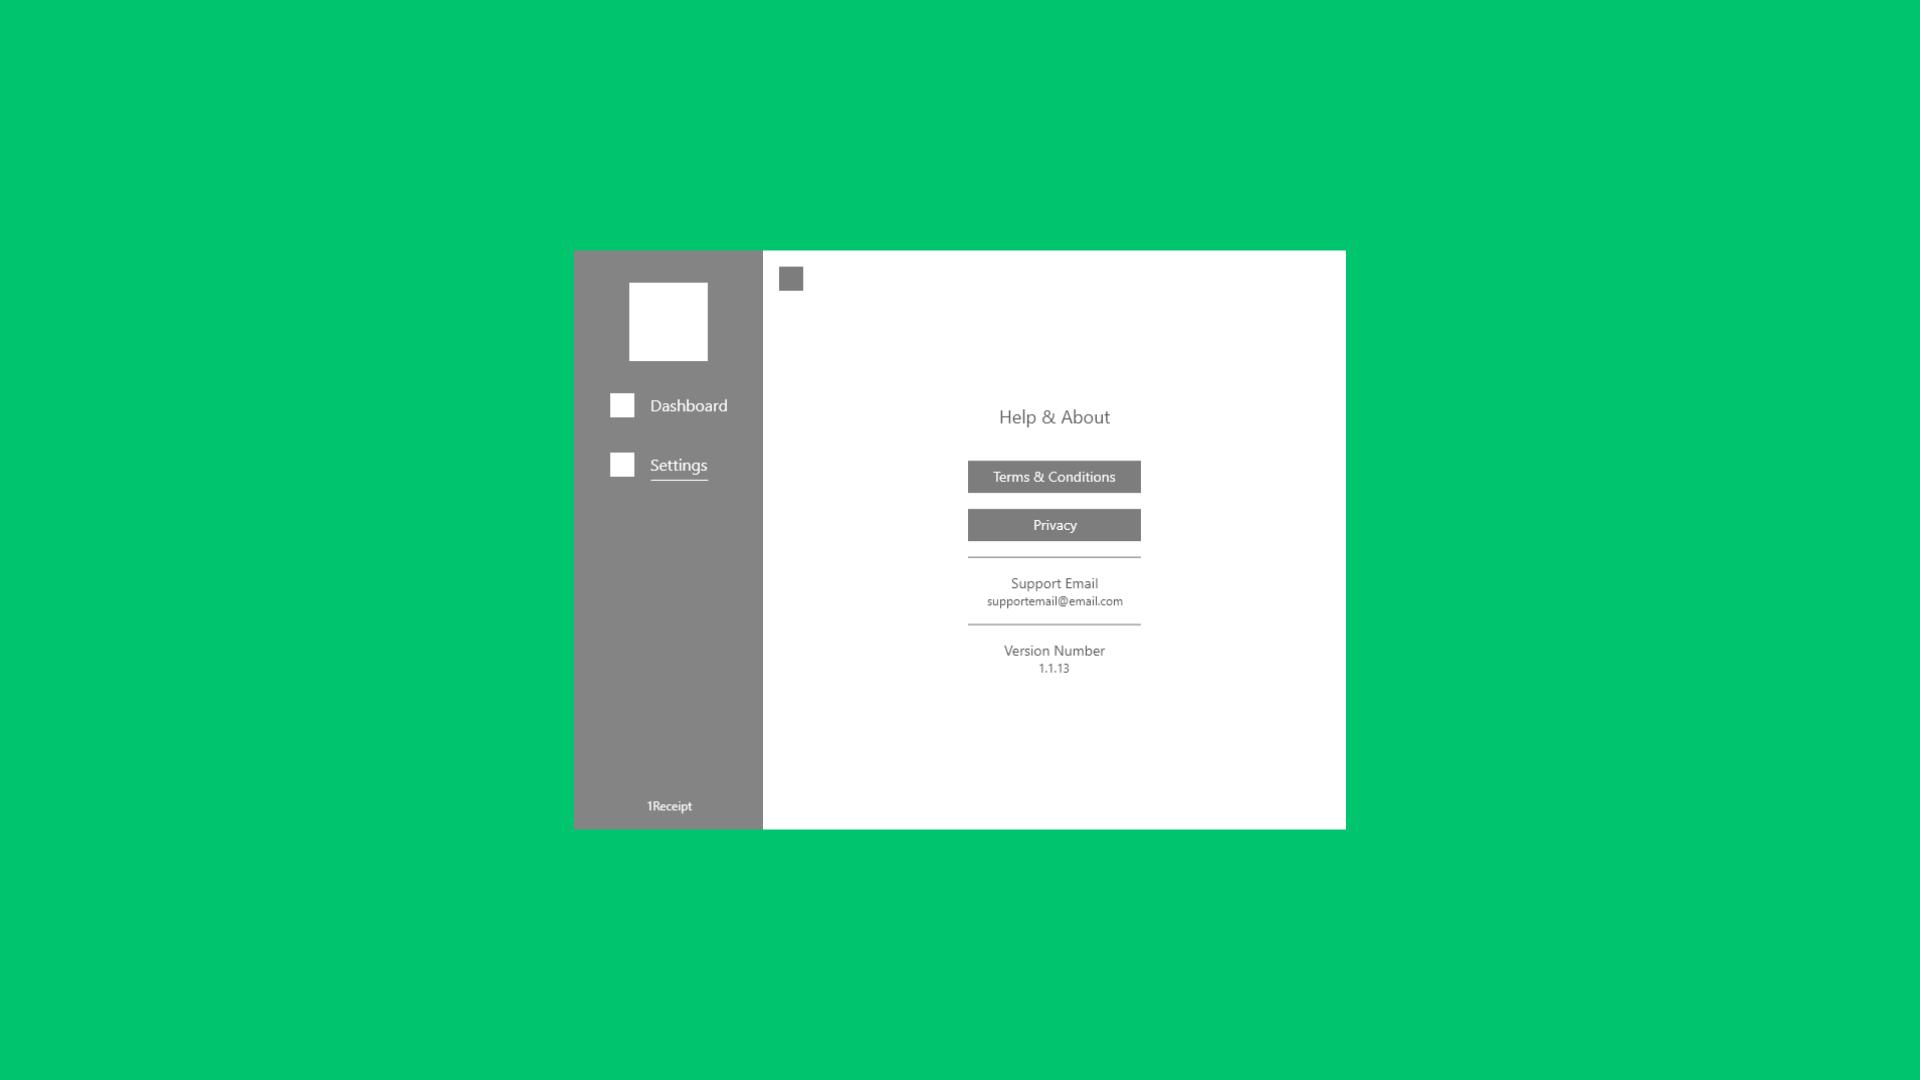 mid-fids - desktop – 3.png